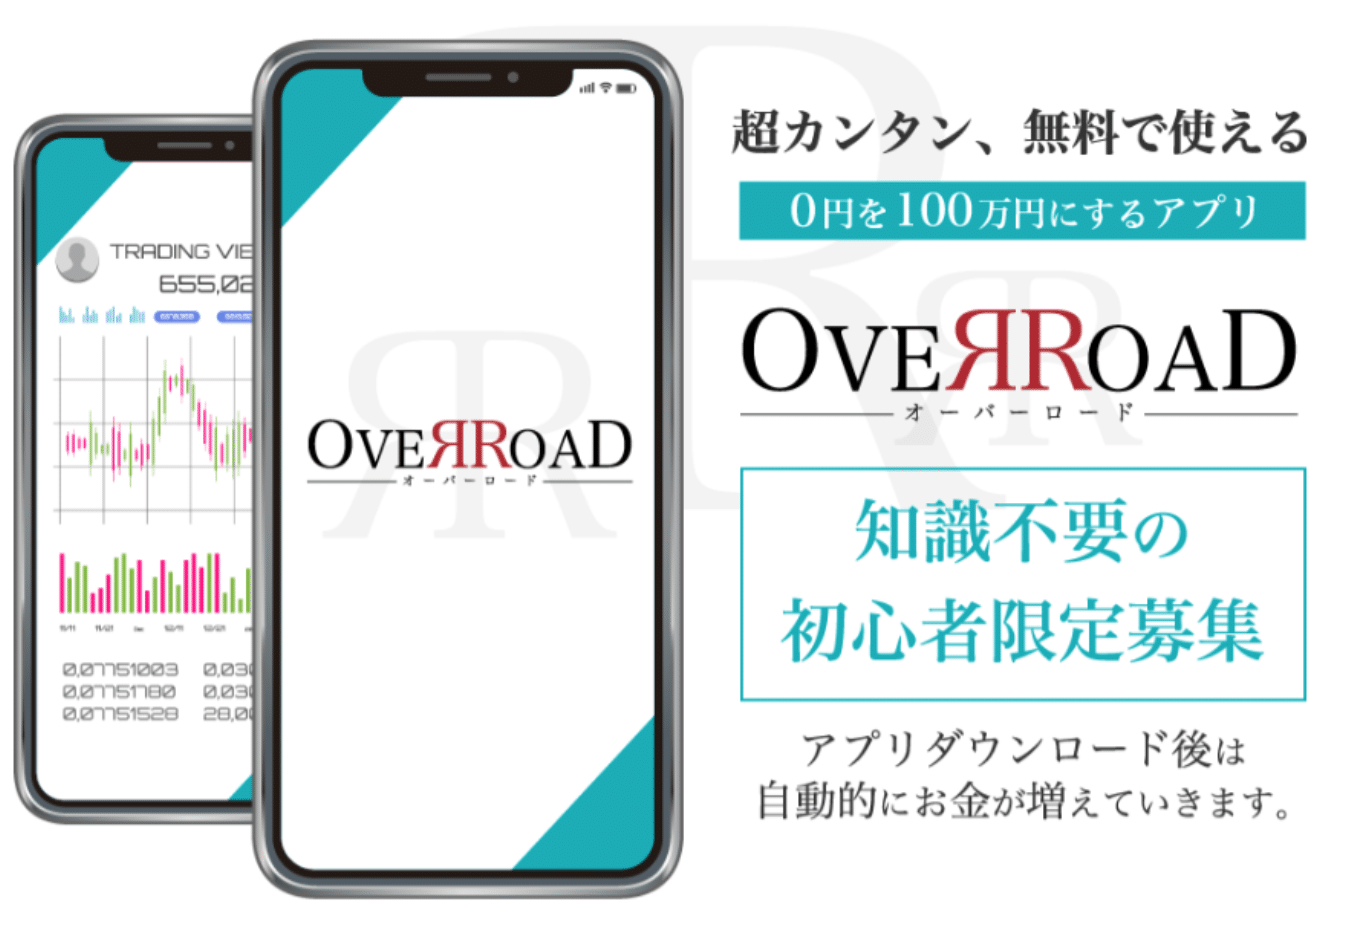 OVER ROAD(オーバーロード) 架空の資産運用!?詐欺?